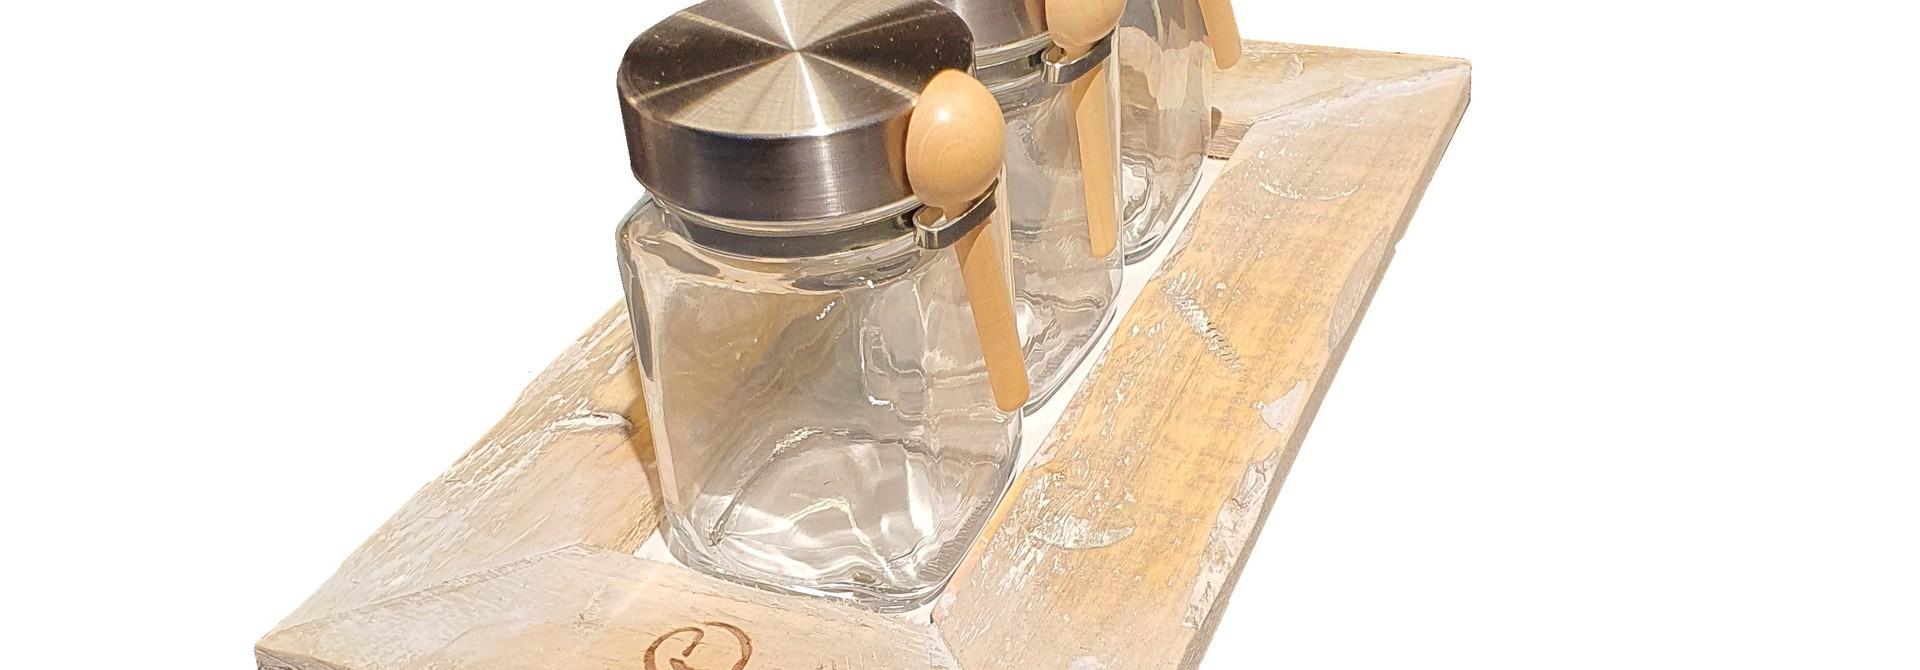 tray old dutch 3 teapot